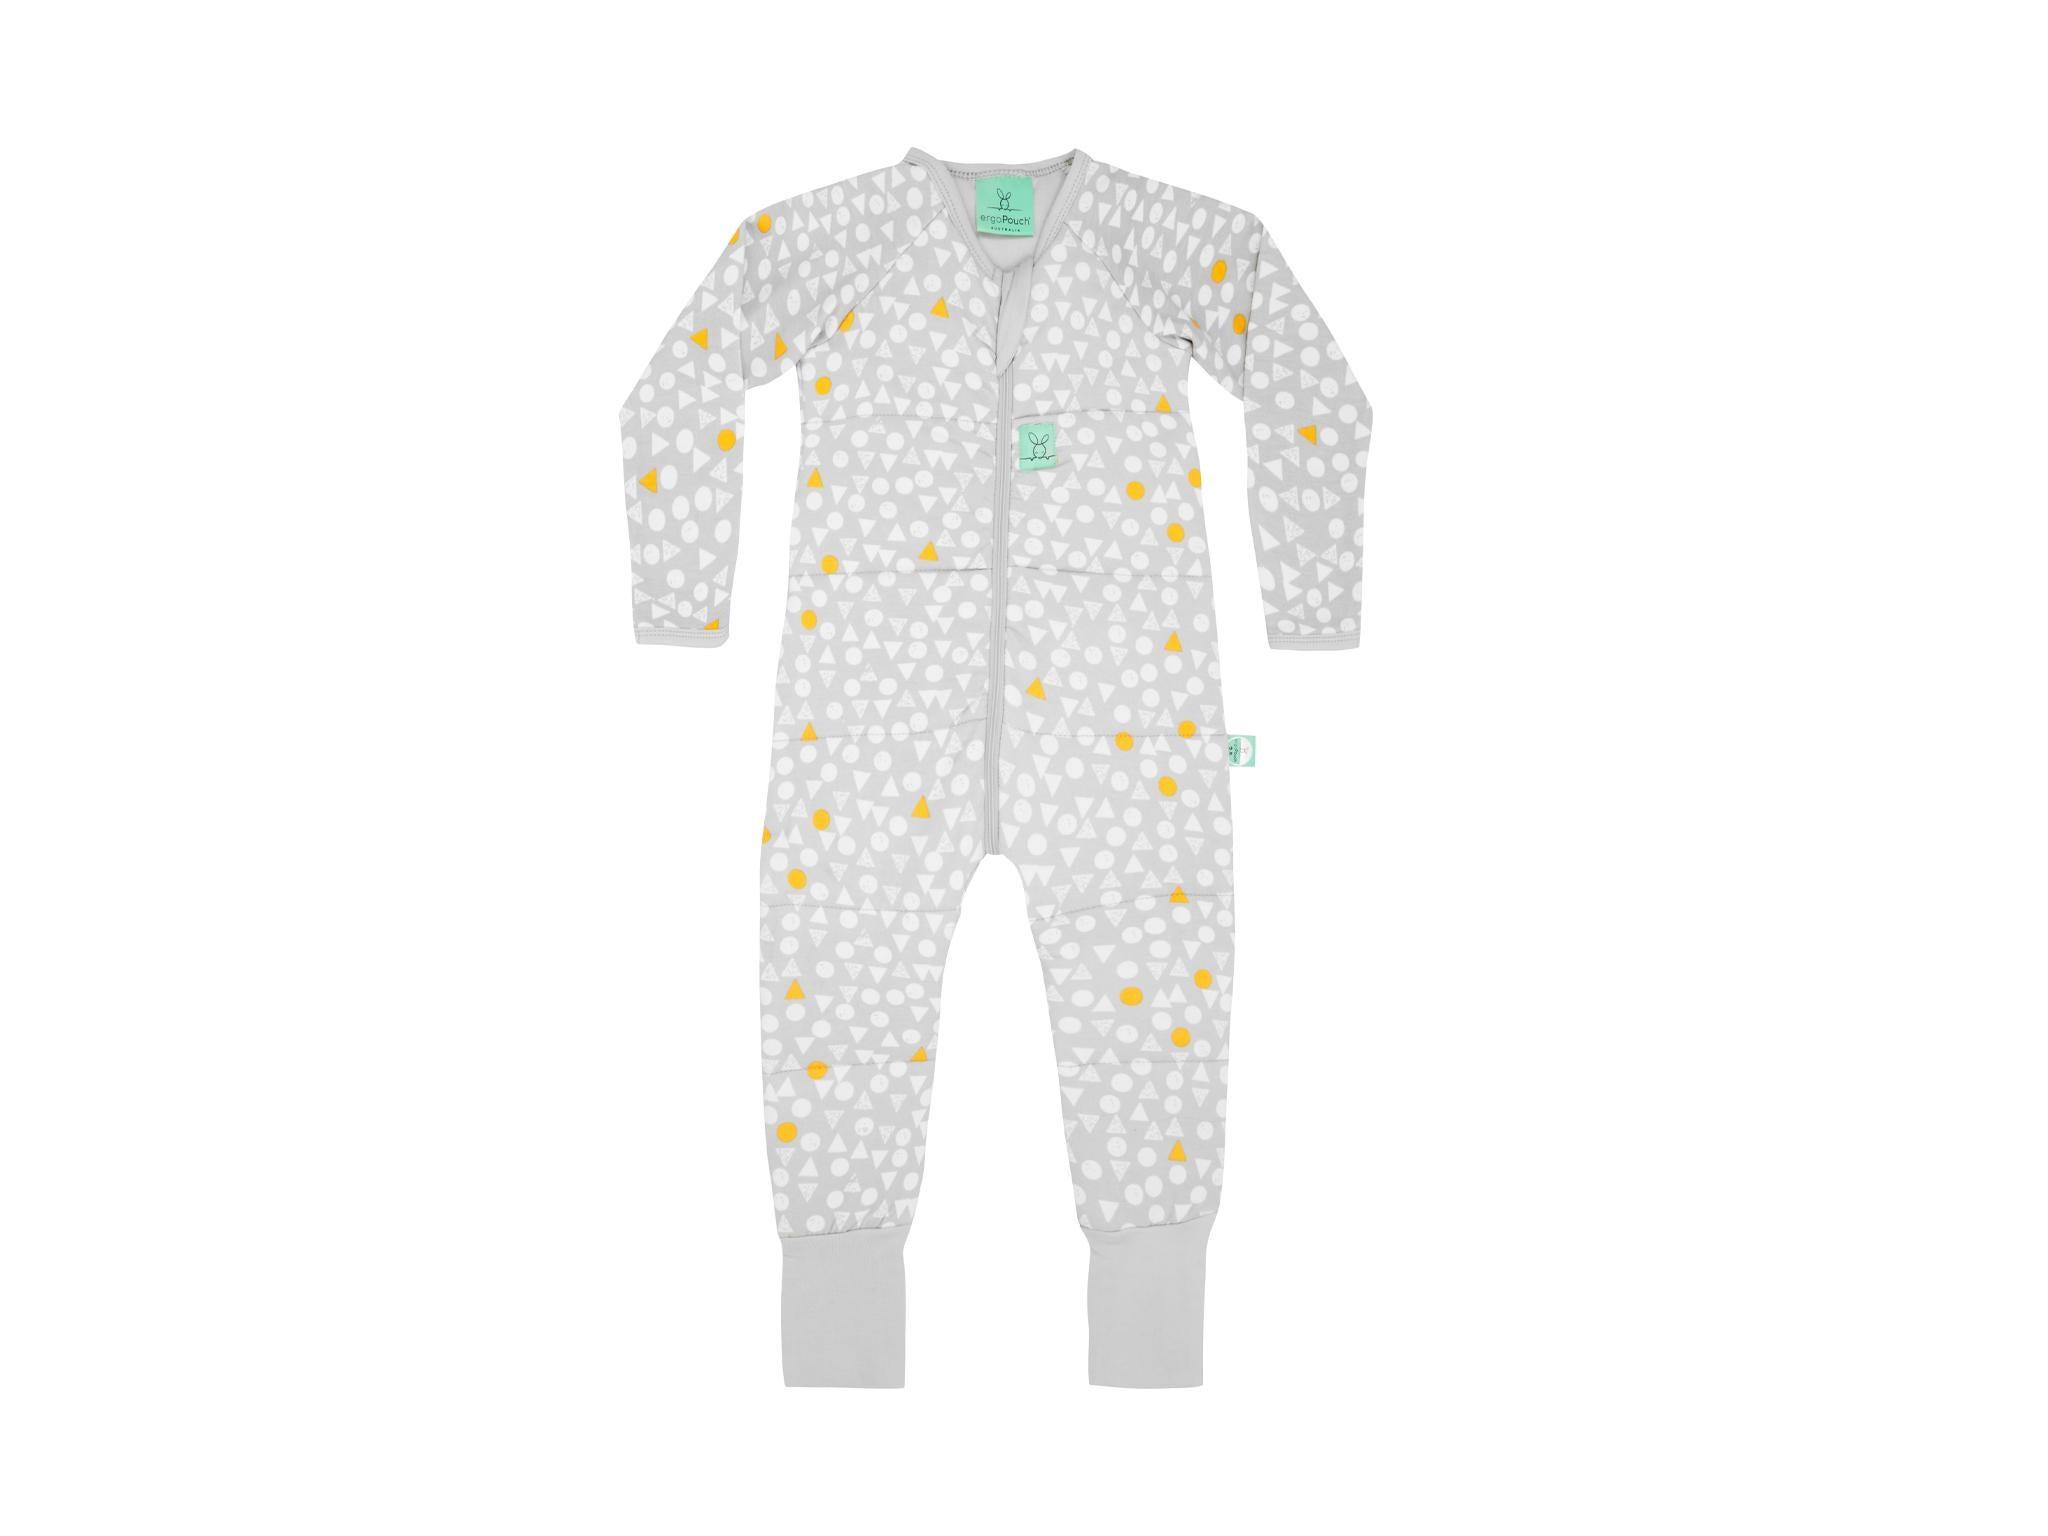 Baby Set Clothes,Mitiy Letter/&Beard,Casual,Daily Beard Letter Romper Jumpsuit+Pants+Hat Set Clothe